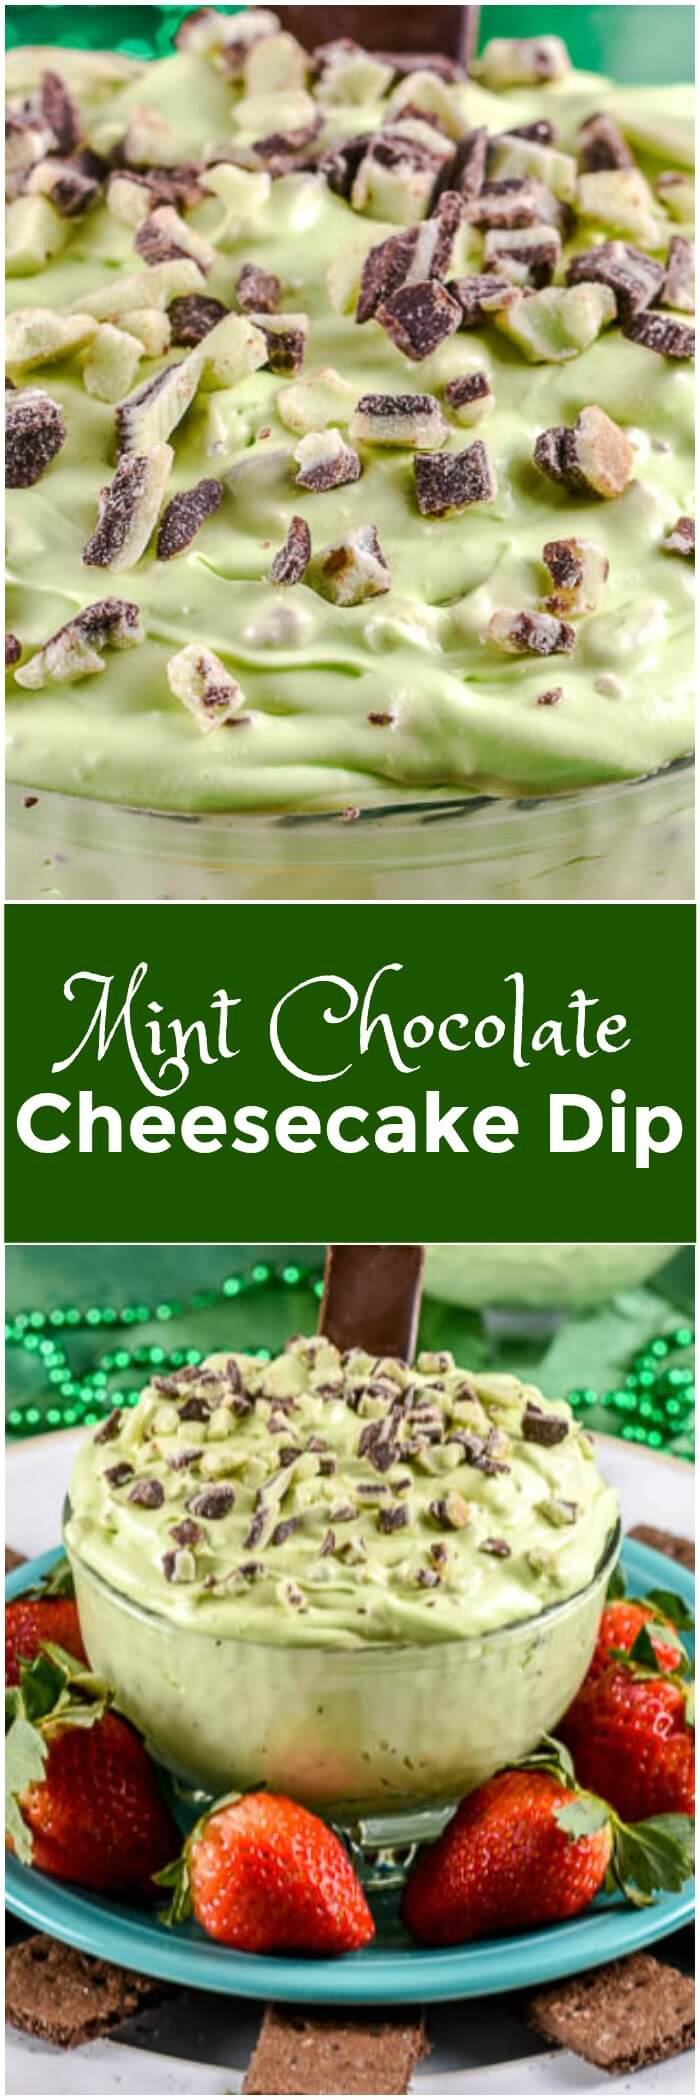 Mint Chocolate Chip Cheesecake Dip